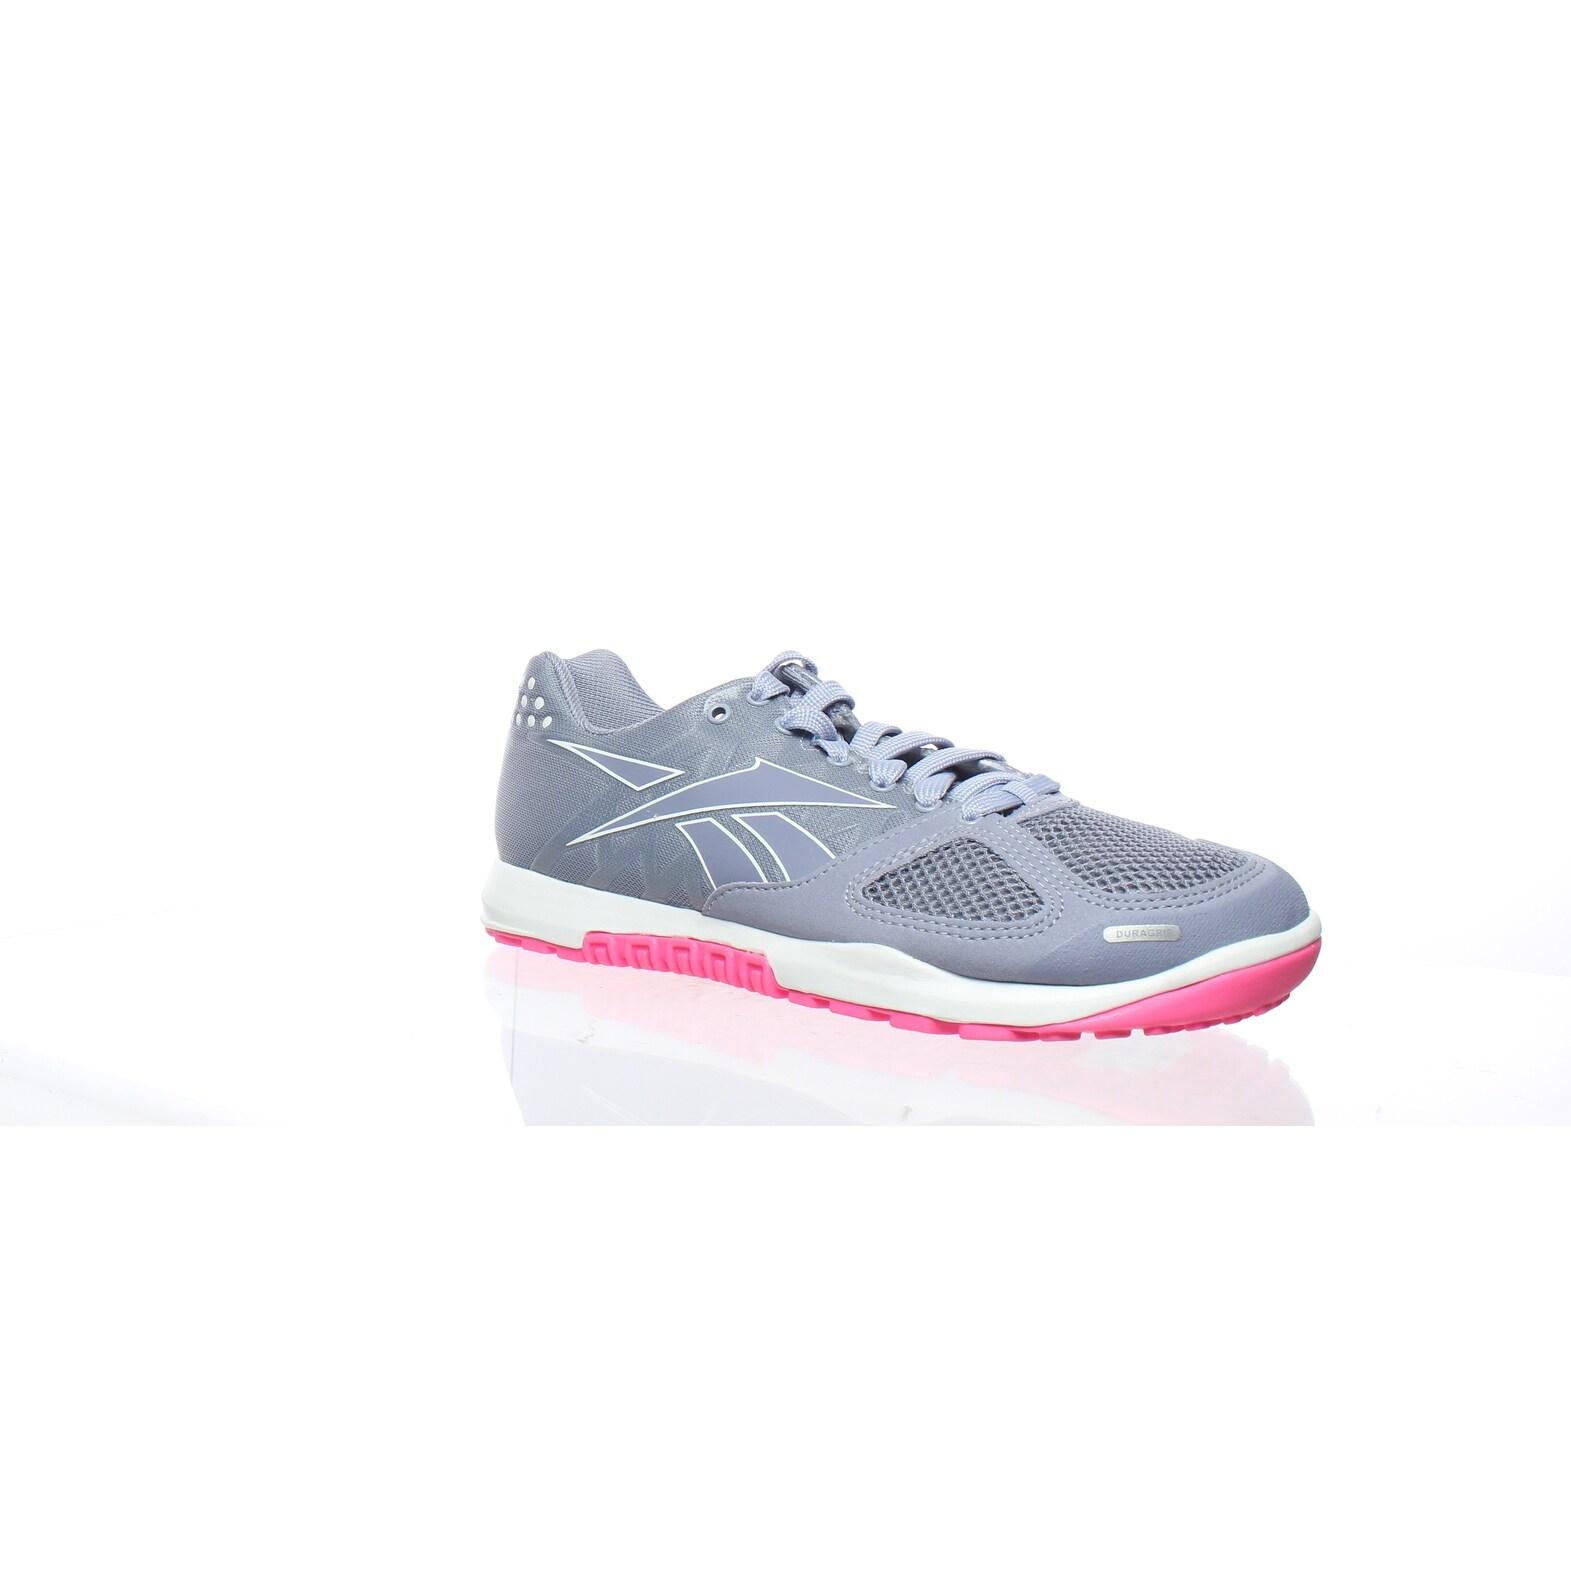 Reebok Womens Crossfit Nano 2.0 Purple Cross Training Shoes Size 6